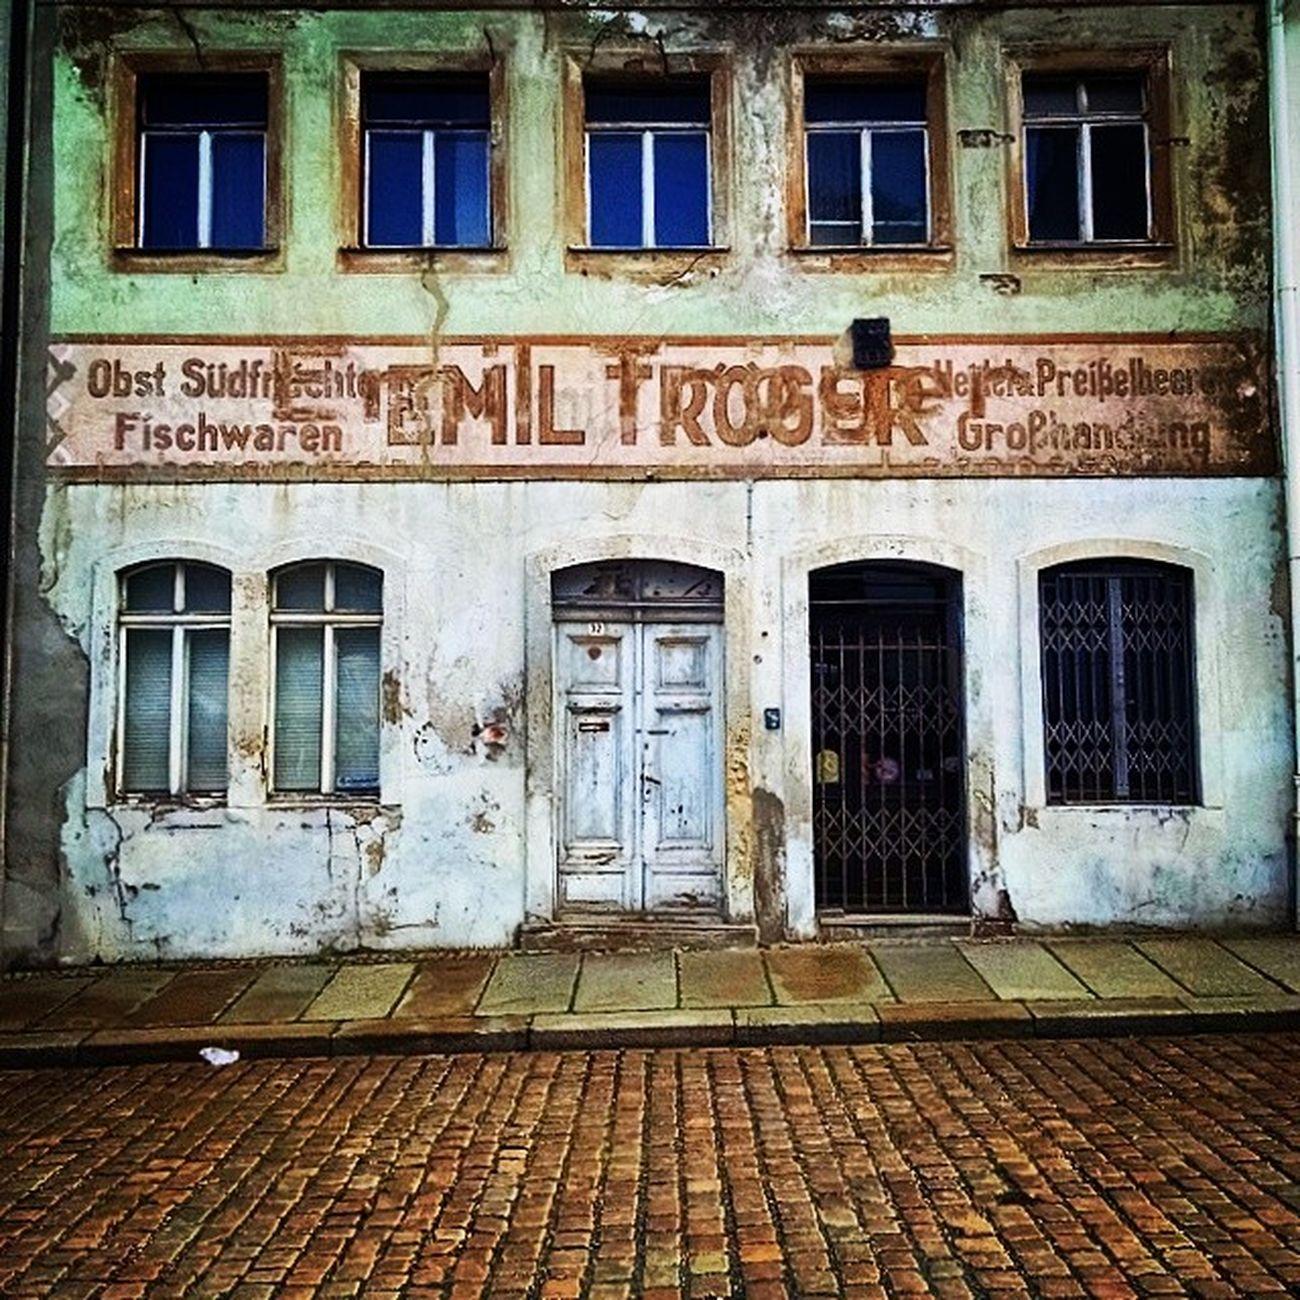 DDR remainings Eastgermany Ost Freiberg Saxony Sachsen Ig_deutschland Ig_germany Ig_europe Insta_international Insta_europe RainyDay